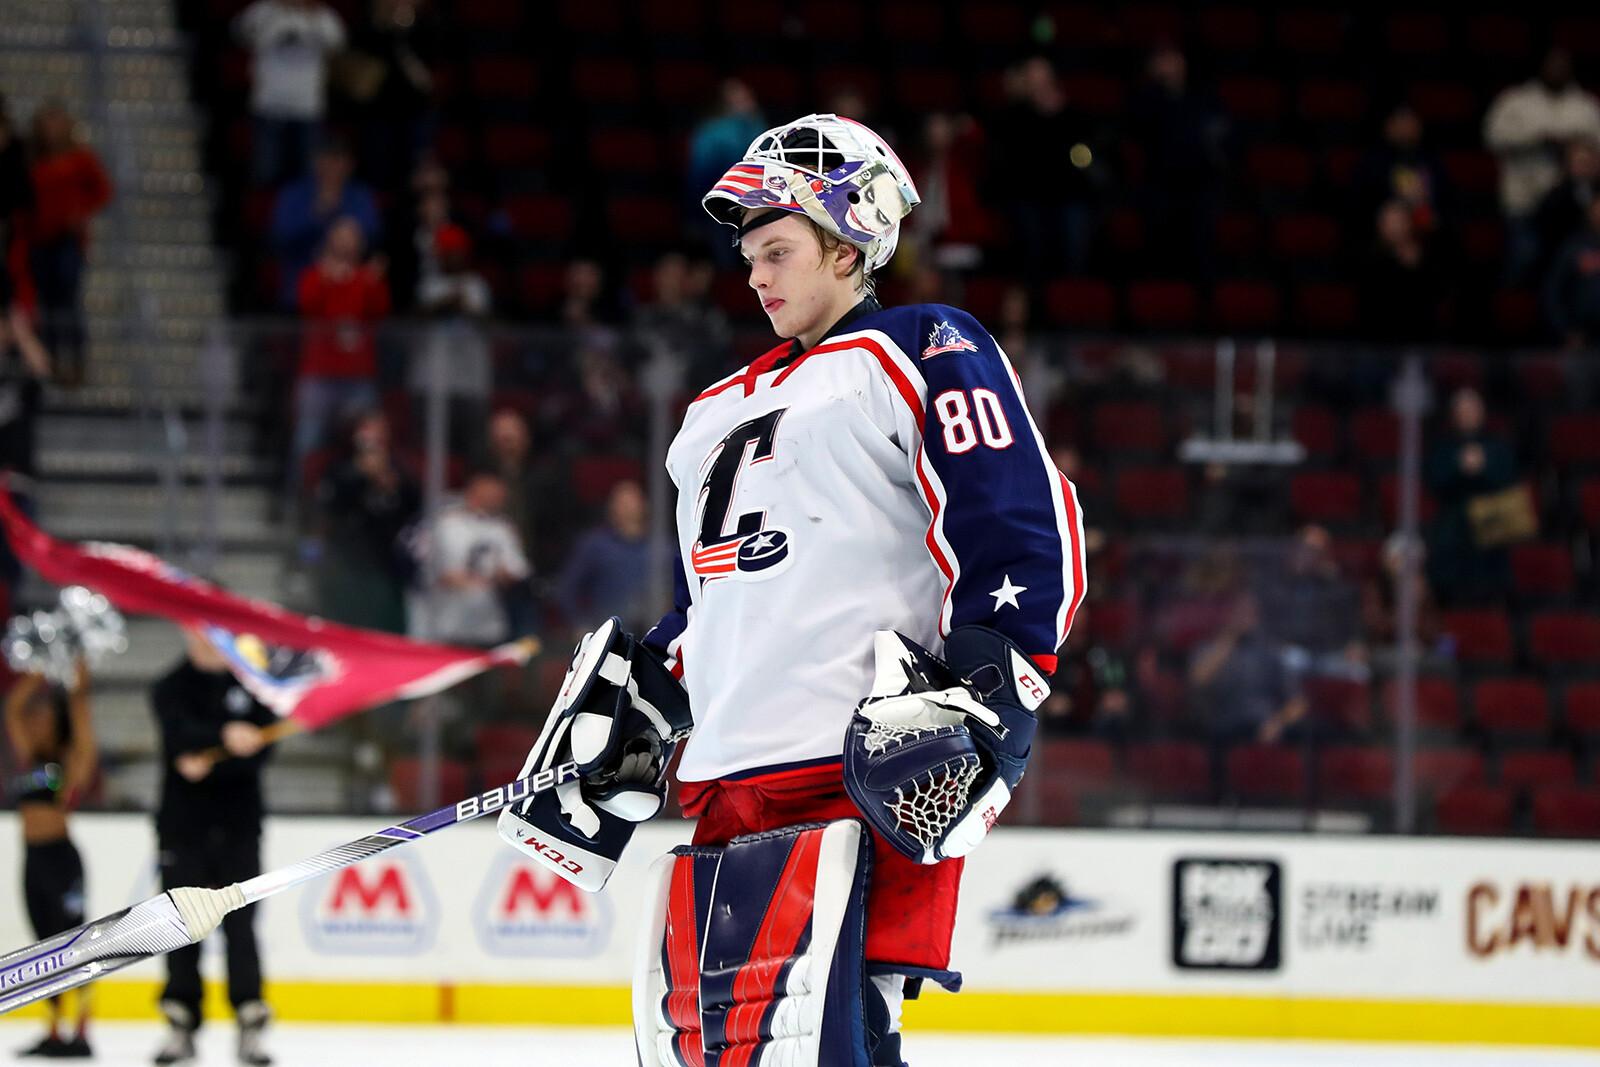 Firework accident that killed NHL goaltender Matiss Kivlenieks was at coach's house, team says